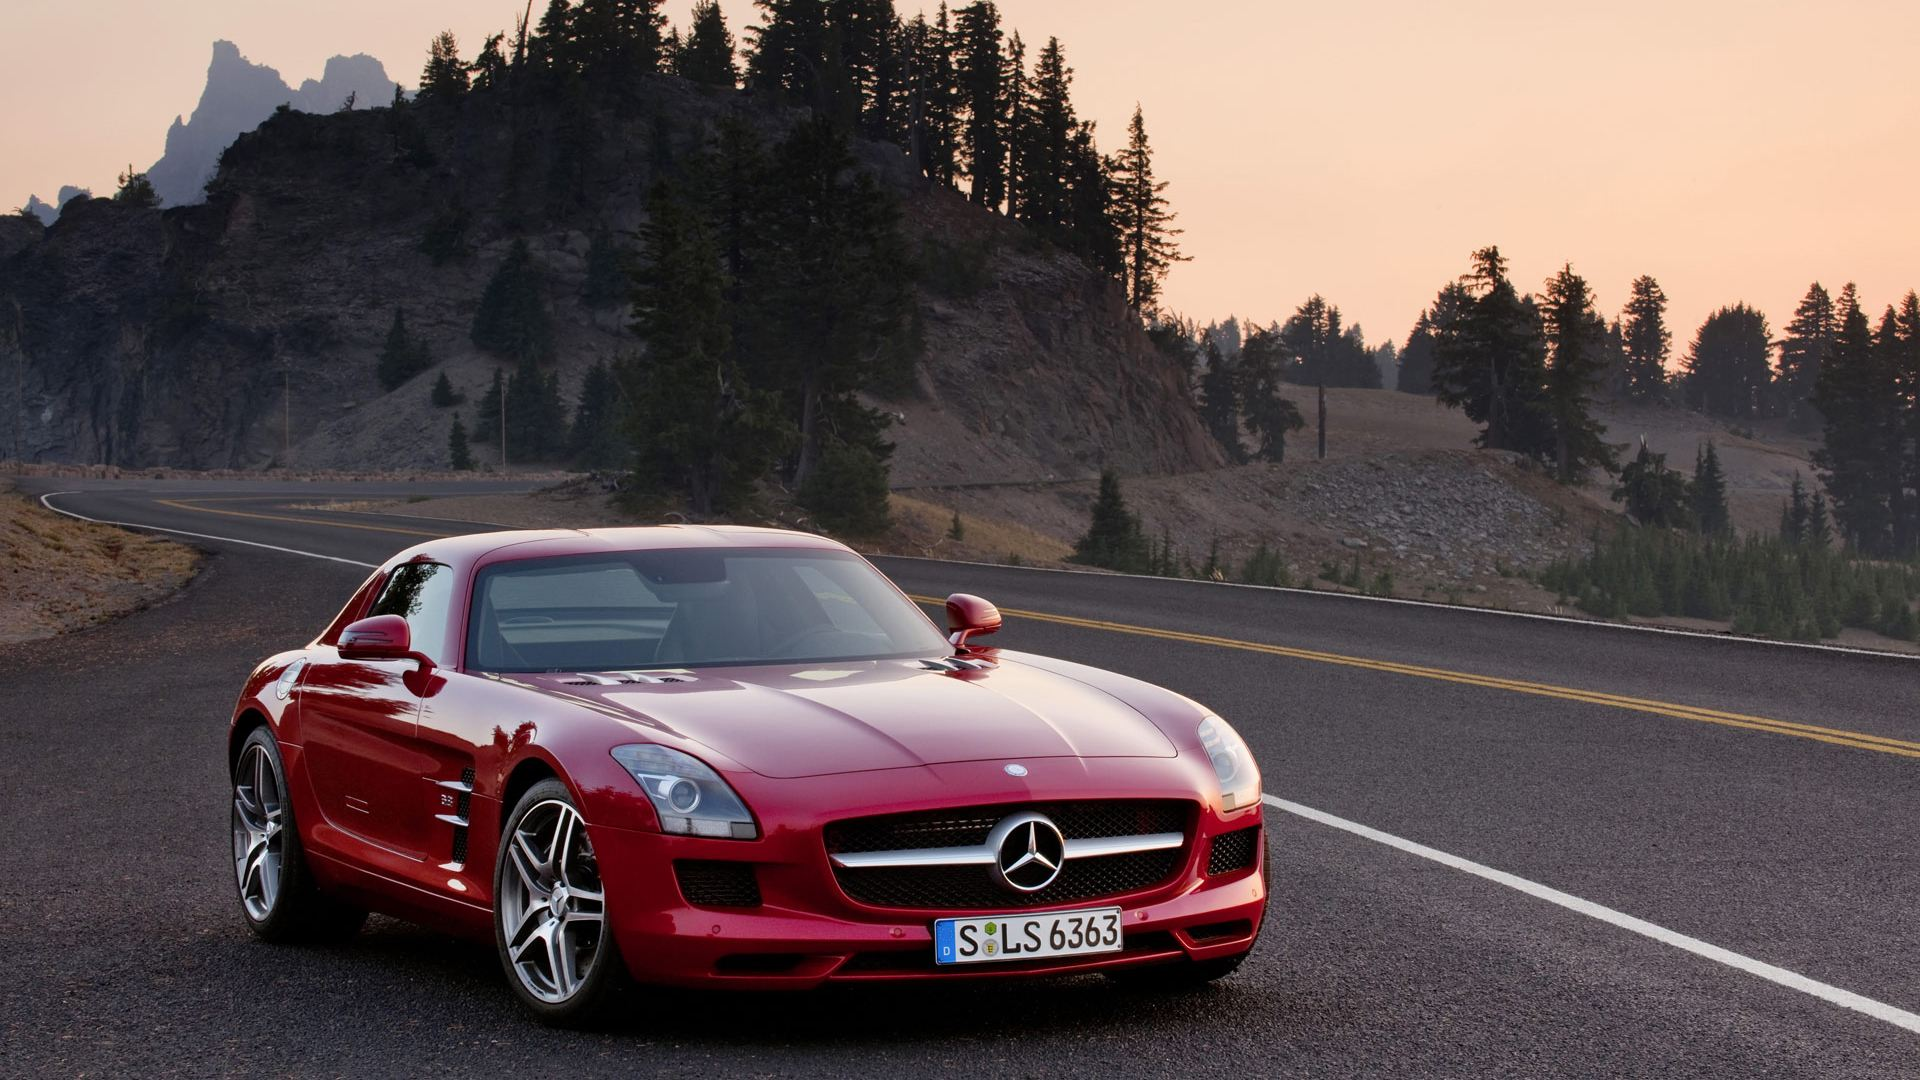 Mercedes-Benz SLS AMG red #2